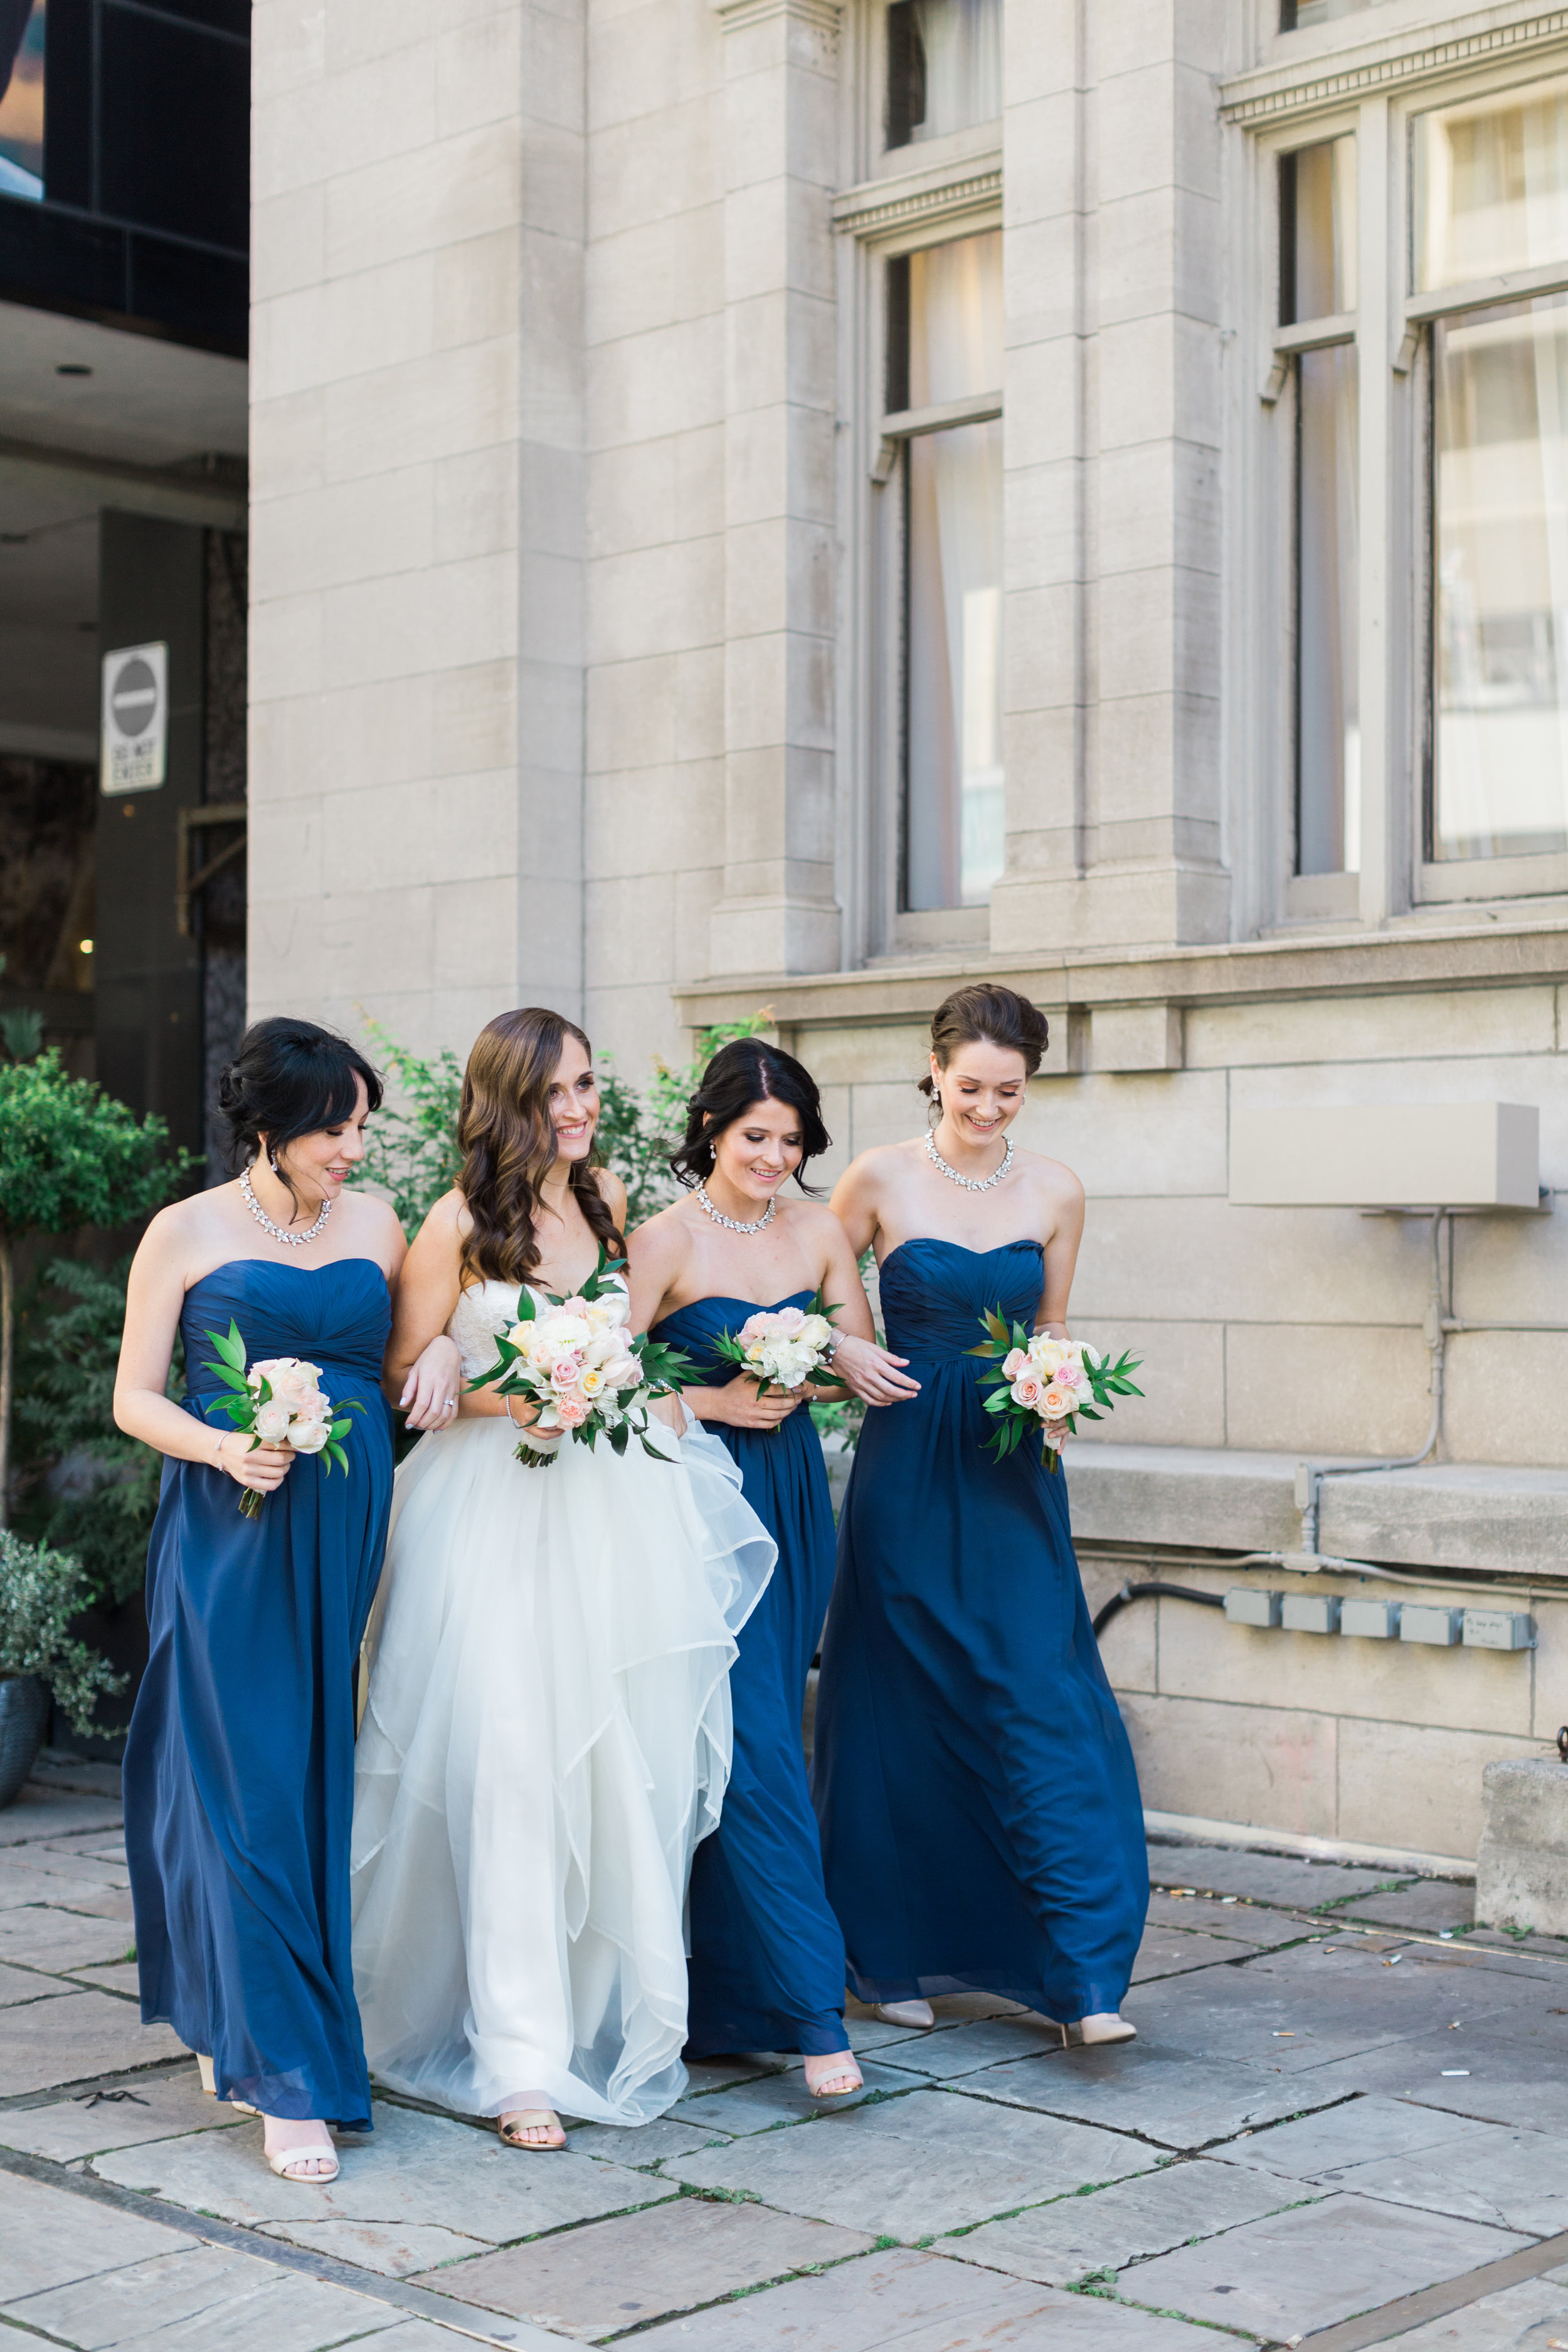 Toronto Fine Art Photographer - Yorkville Wedding - Bridal Party Portraits-41.jpg